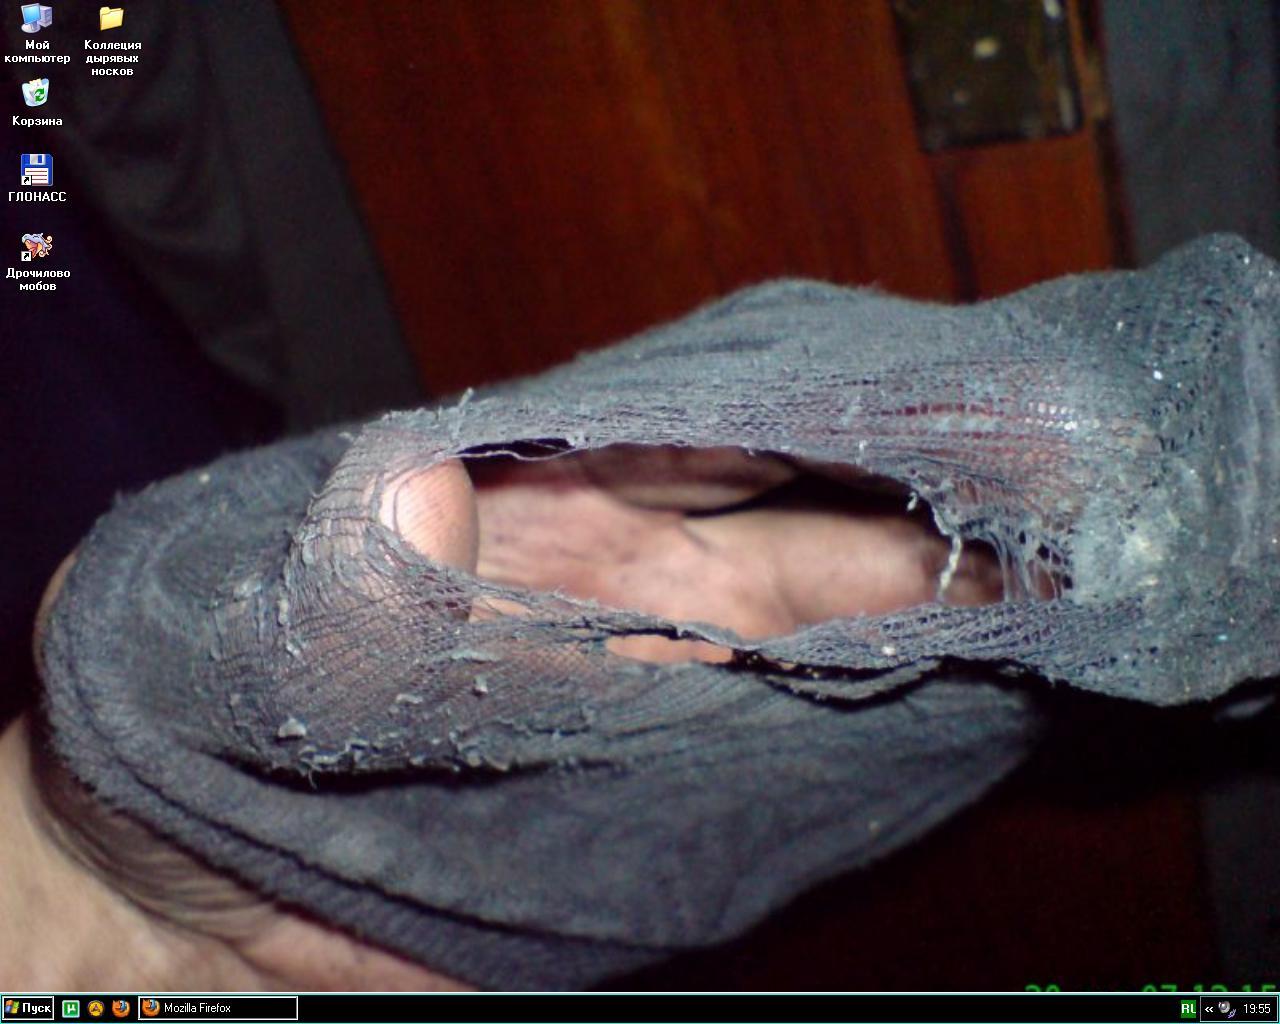 фото раб нюхает и лижет обувь госпожи